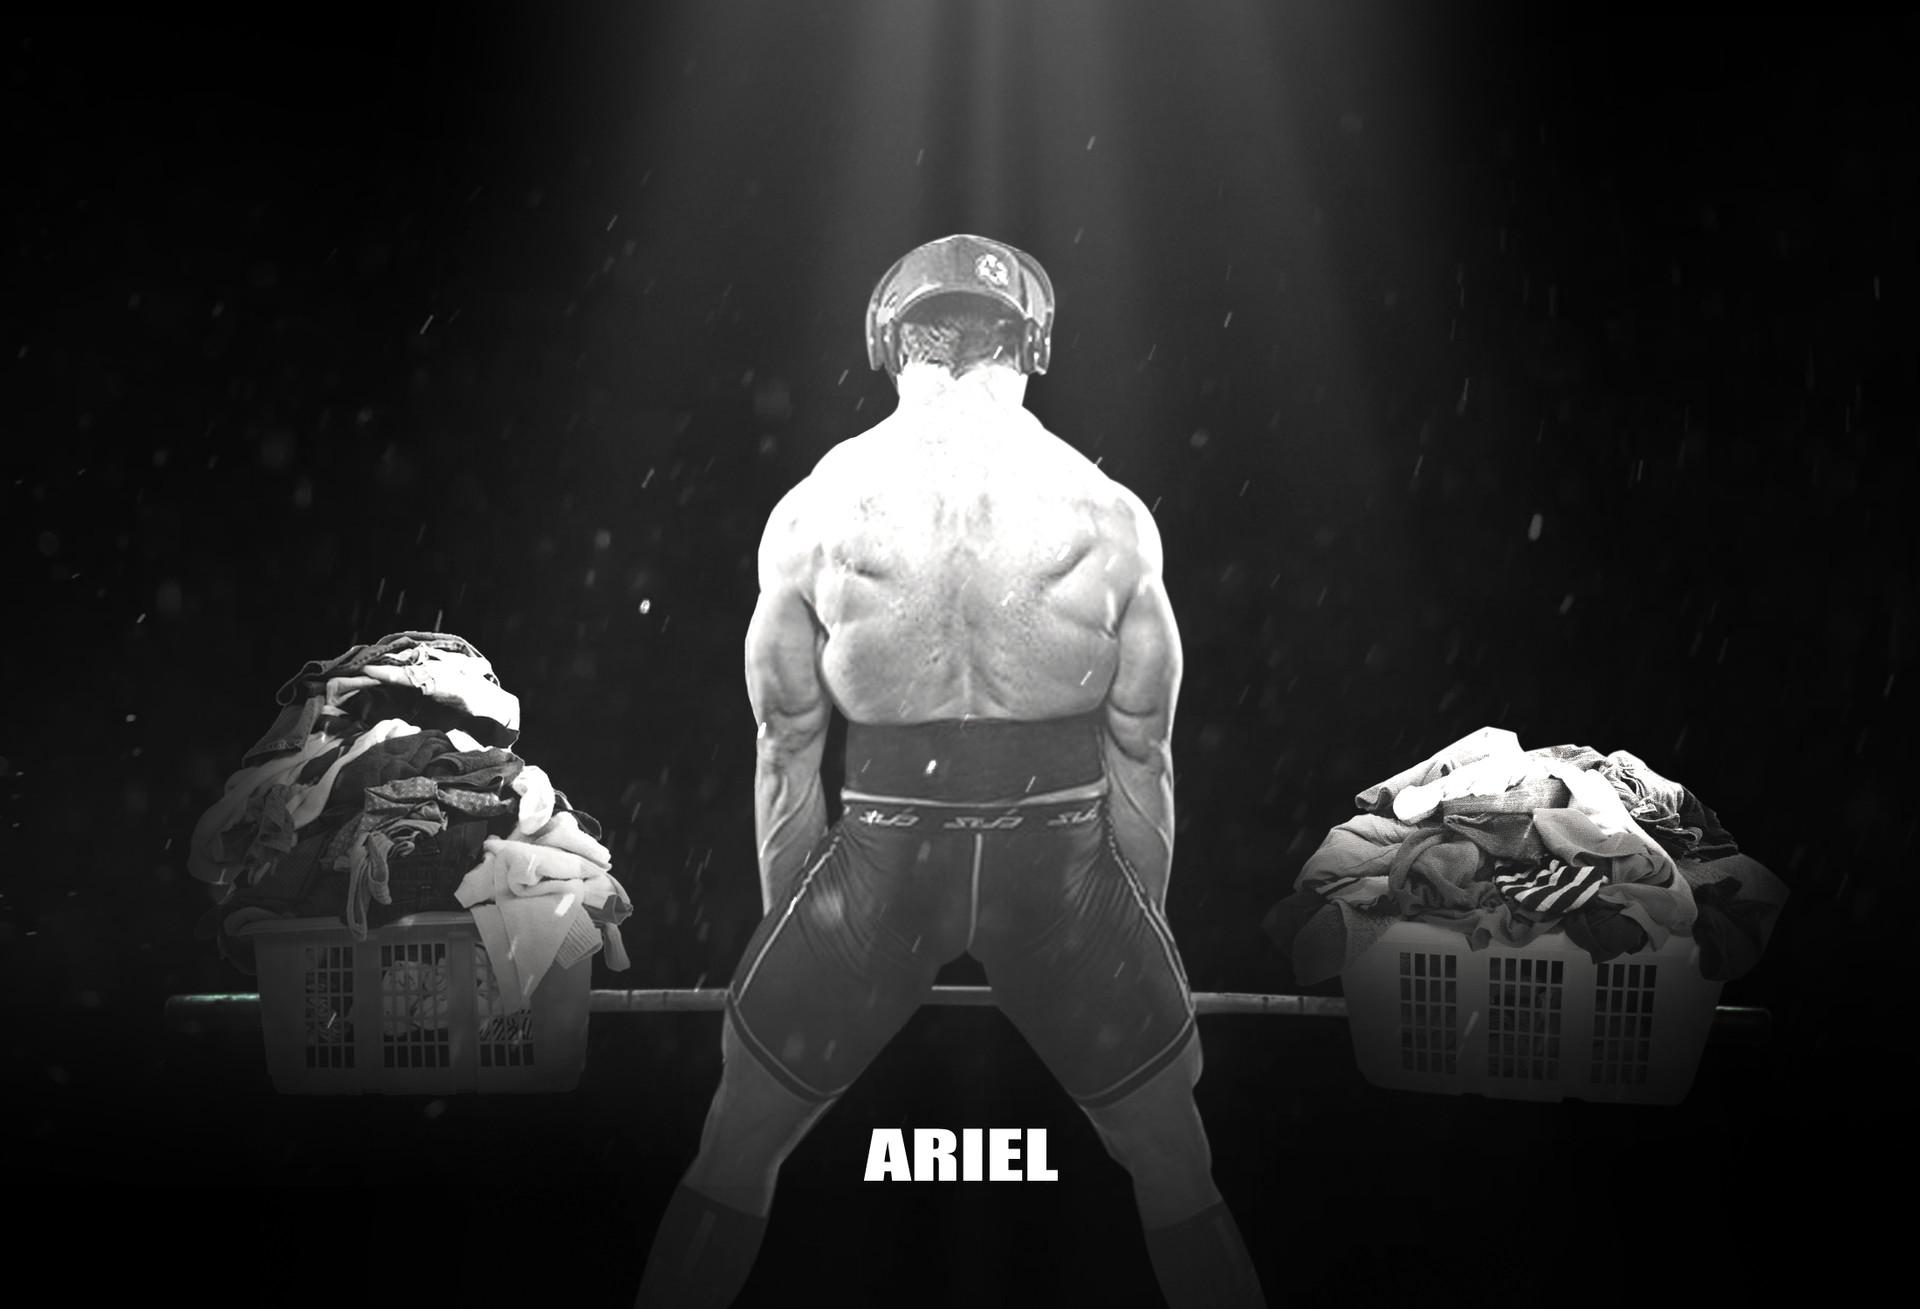 ArtStation - ARIEL (LAUNDRY DETERGENT) CONCEPT AD, Juan